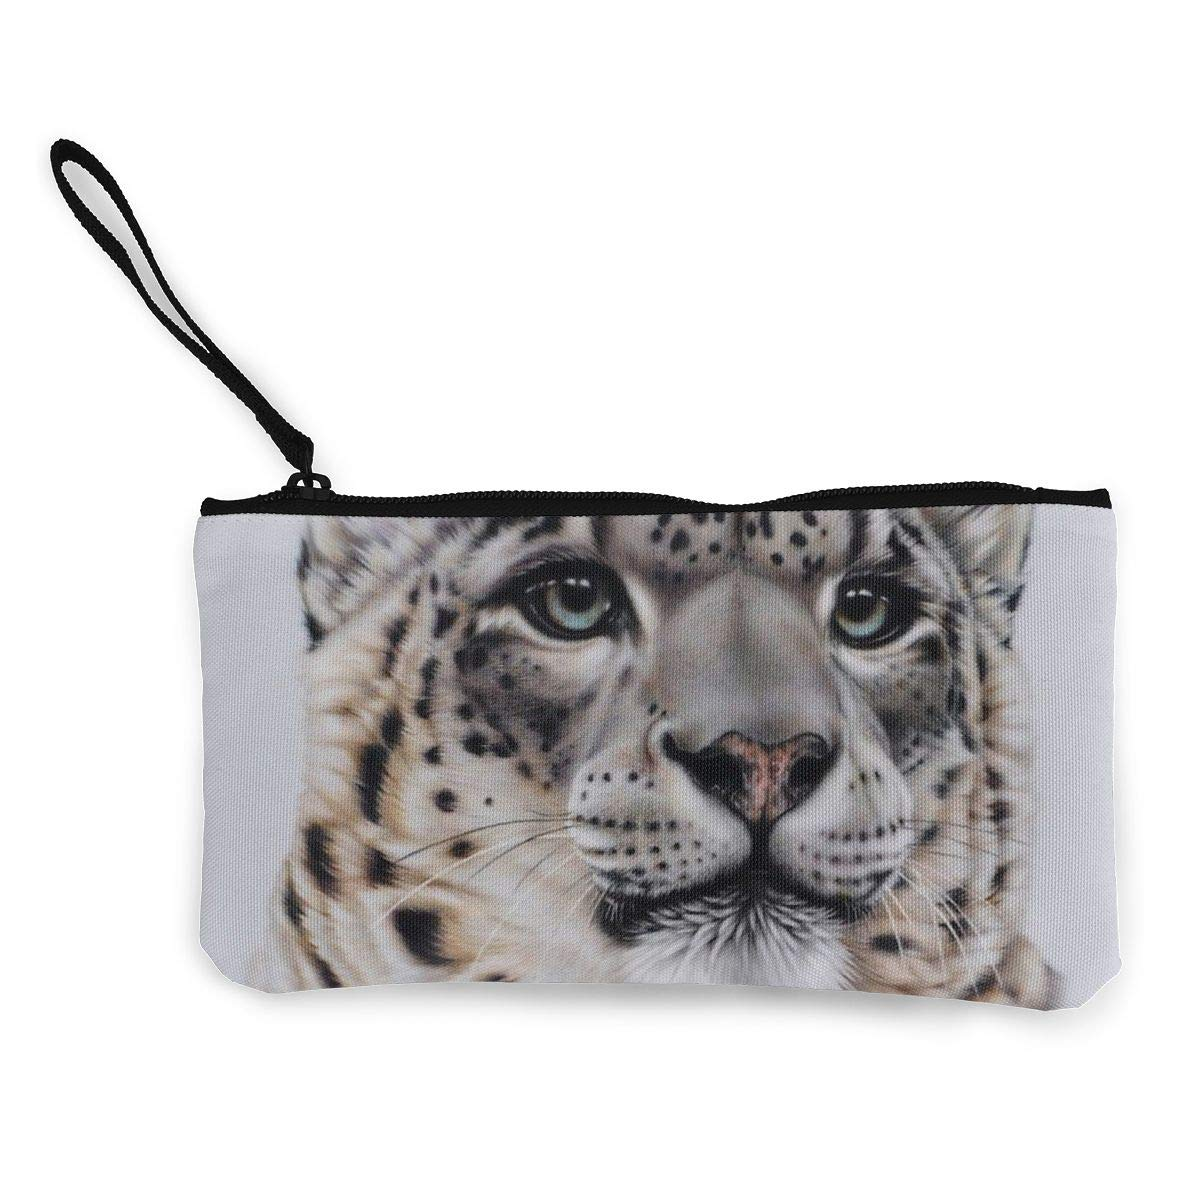 Canvas Cash Coin Purse,Diamond Diy Painting Leopard Print Make Up Bag Zipper Small Purse Wallets